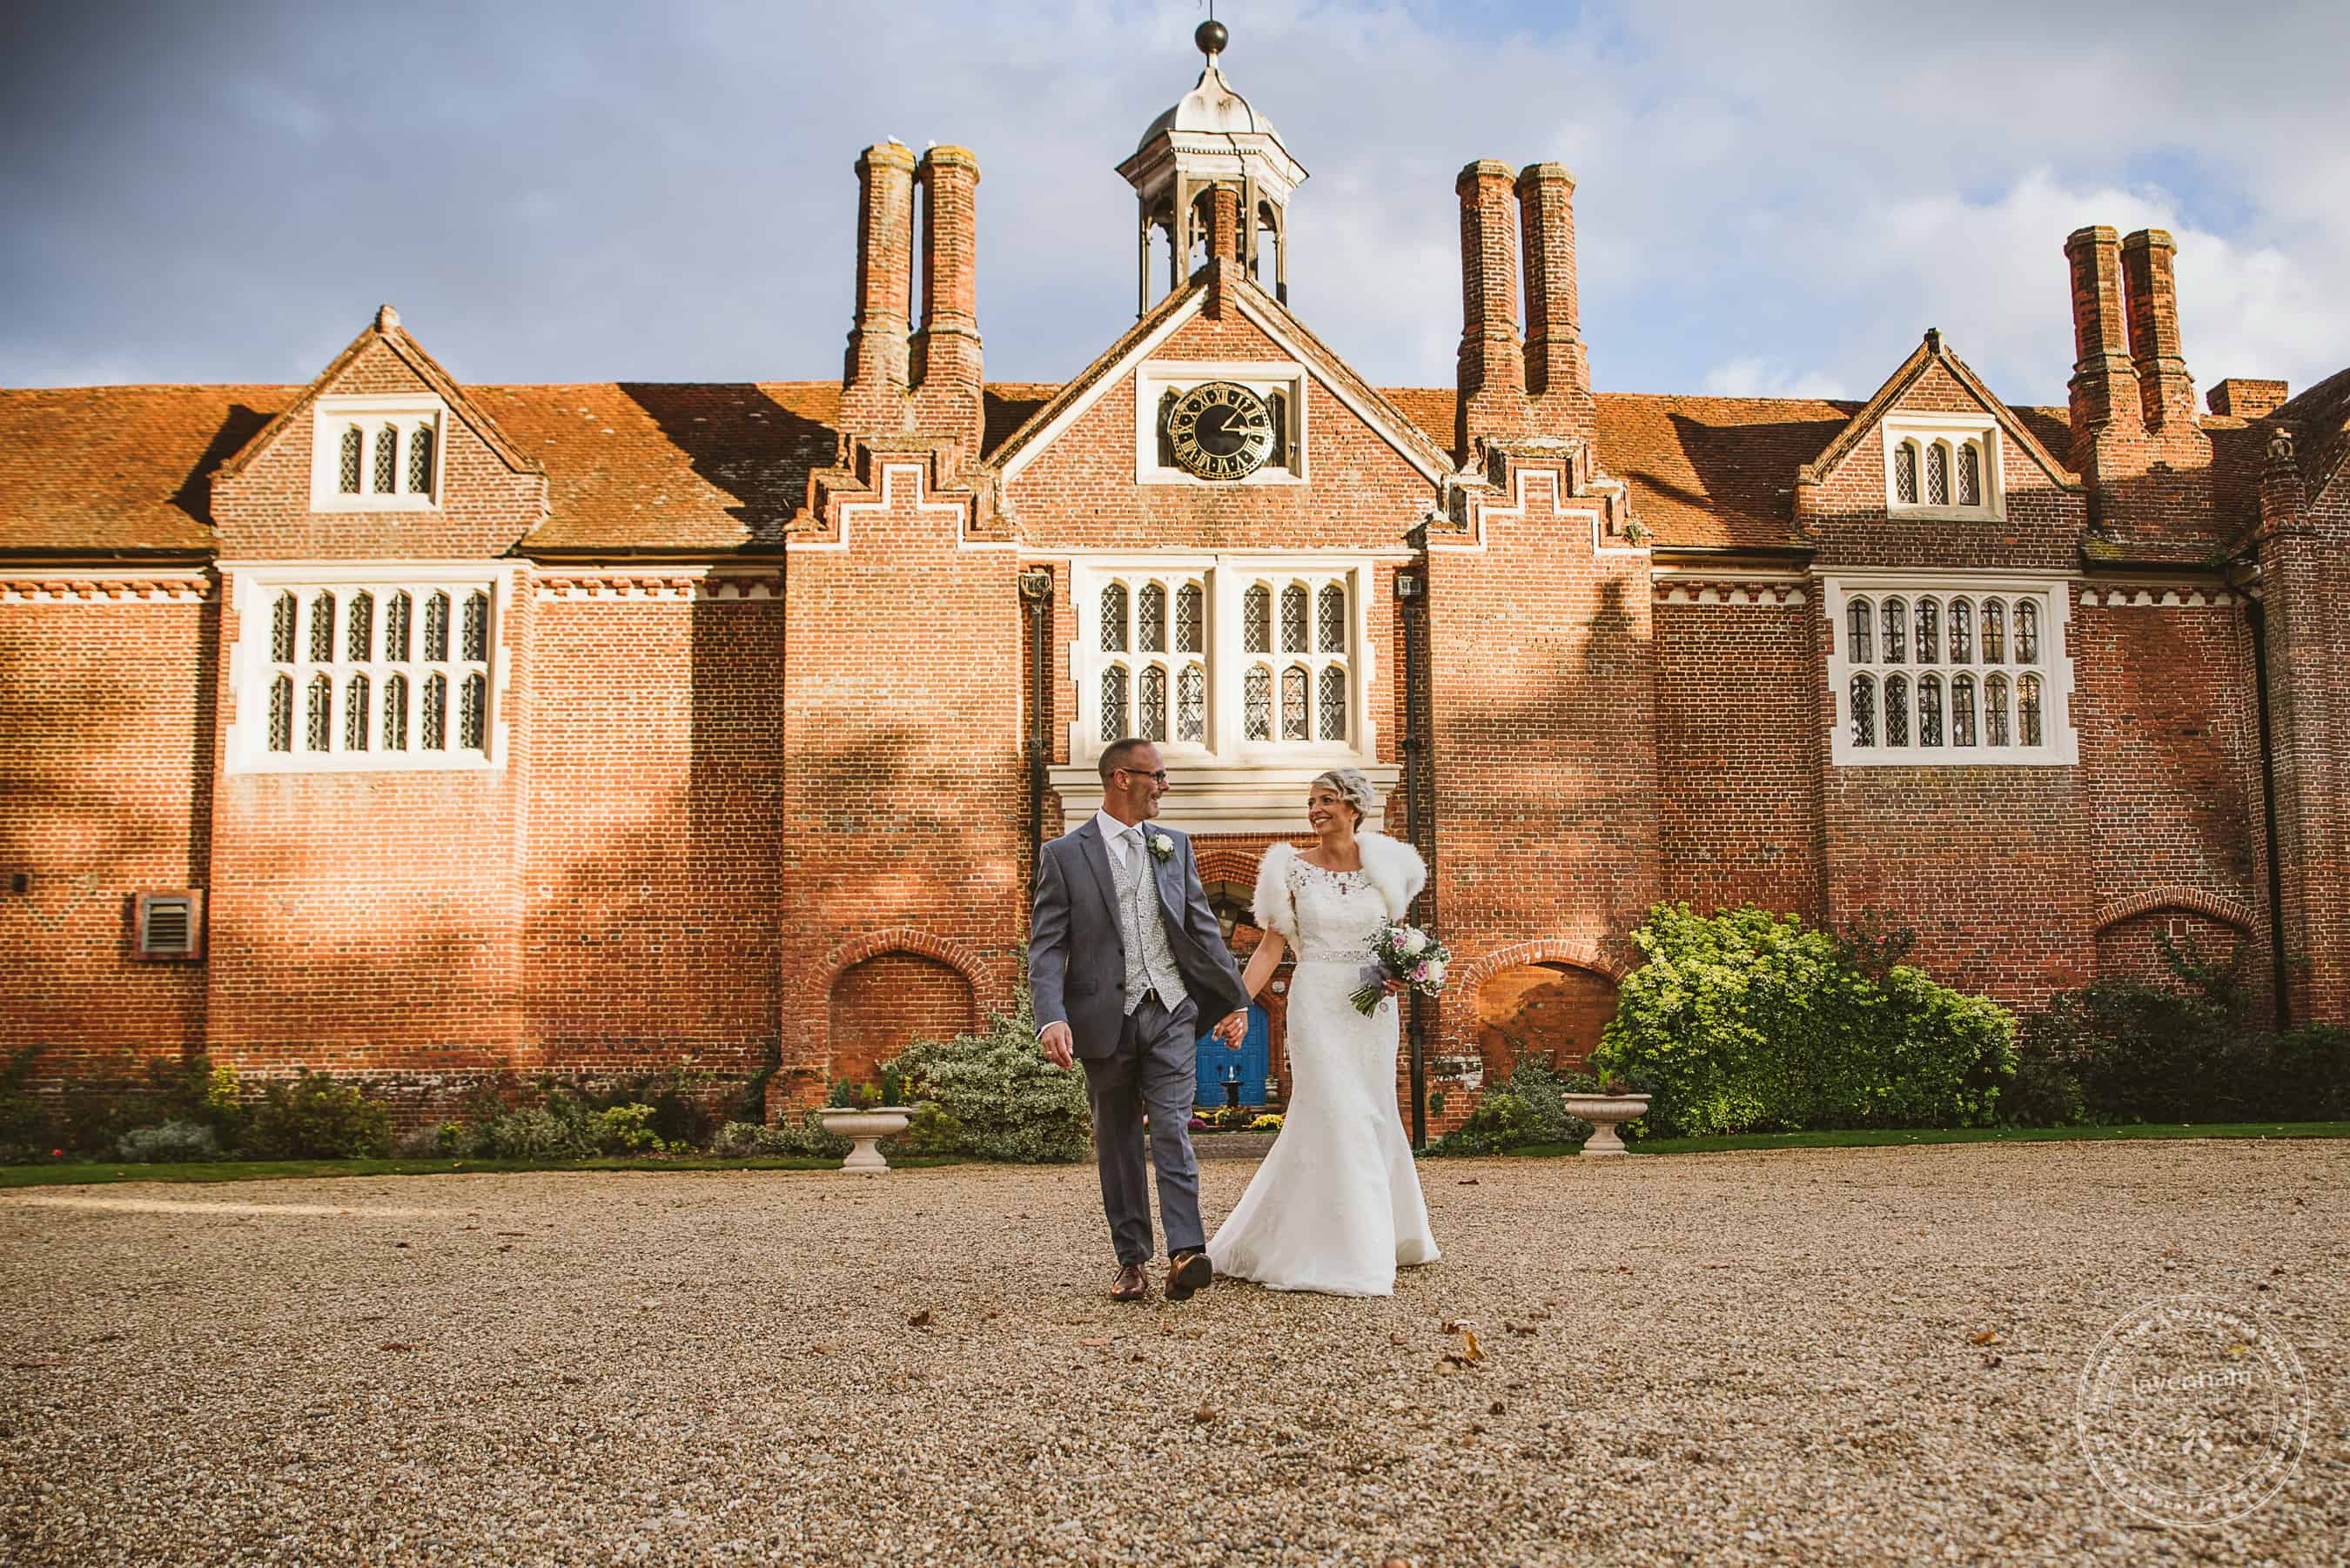 281018 Gosfield Hall Wedding Photography Lavenham Photographic 084